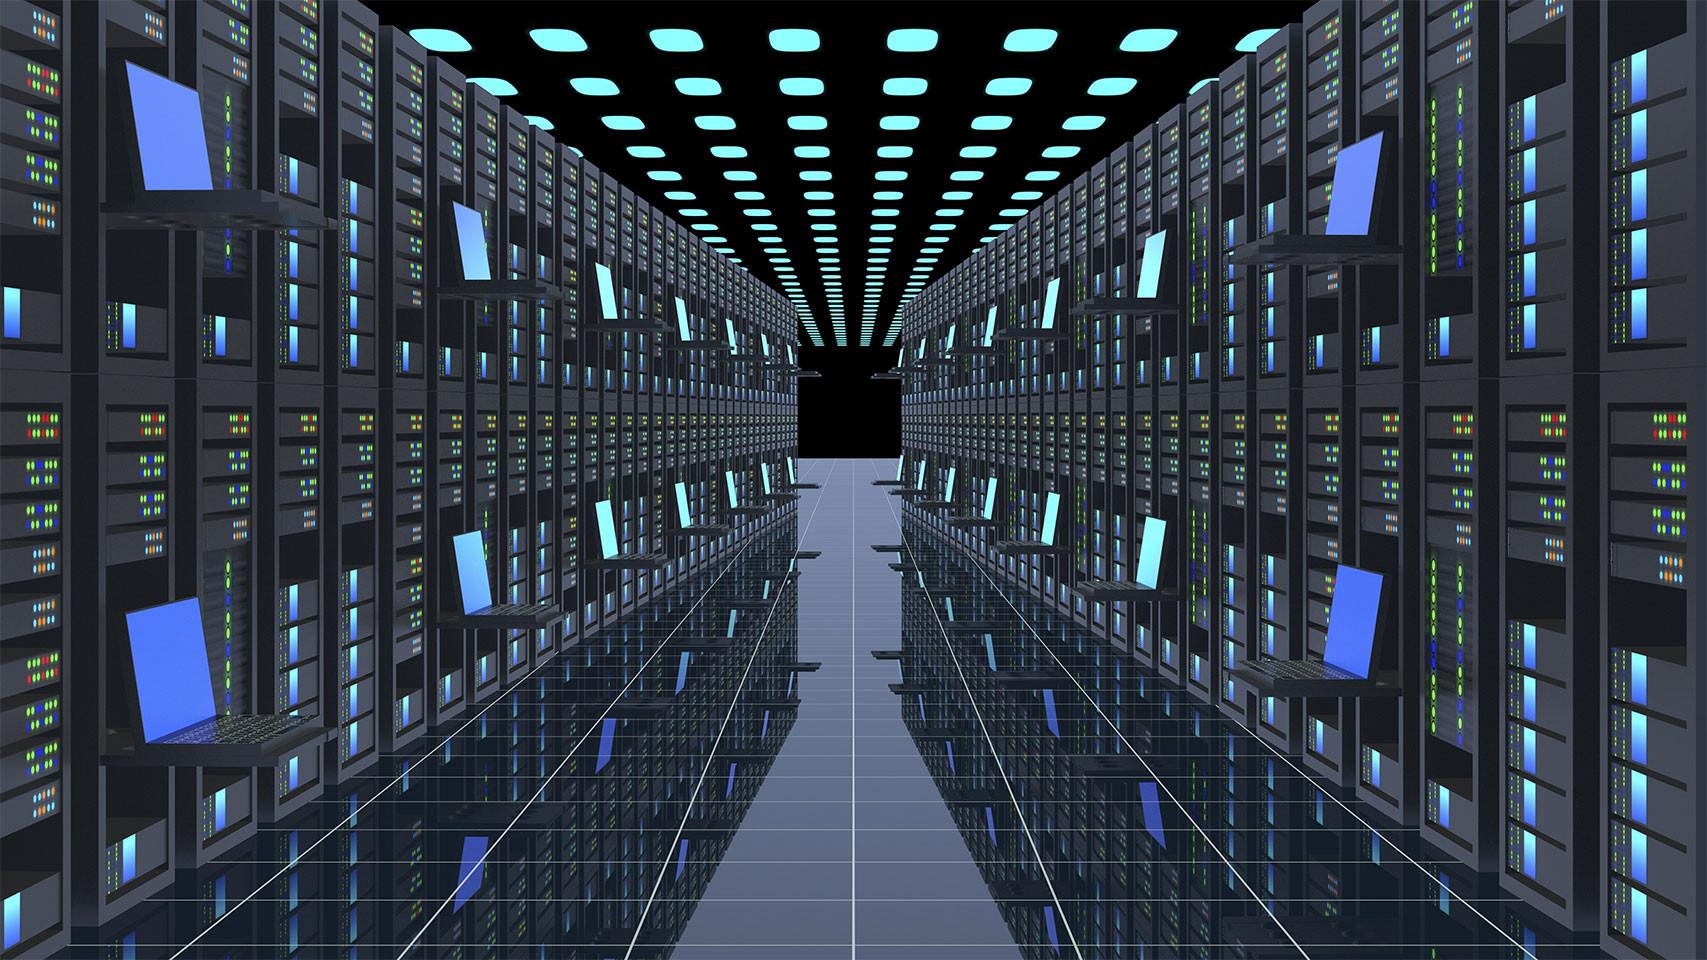 nvidia servers status